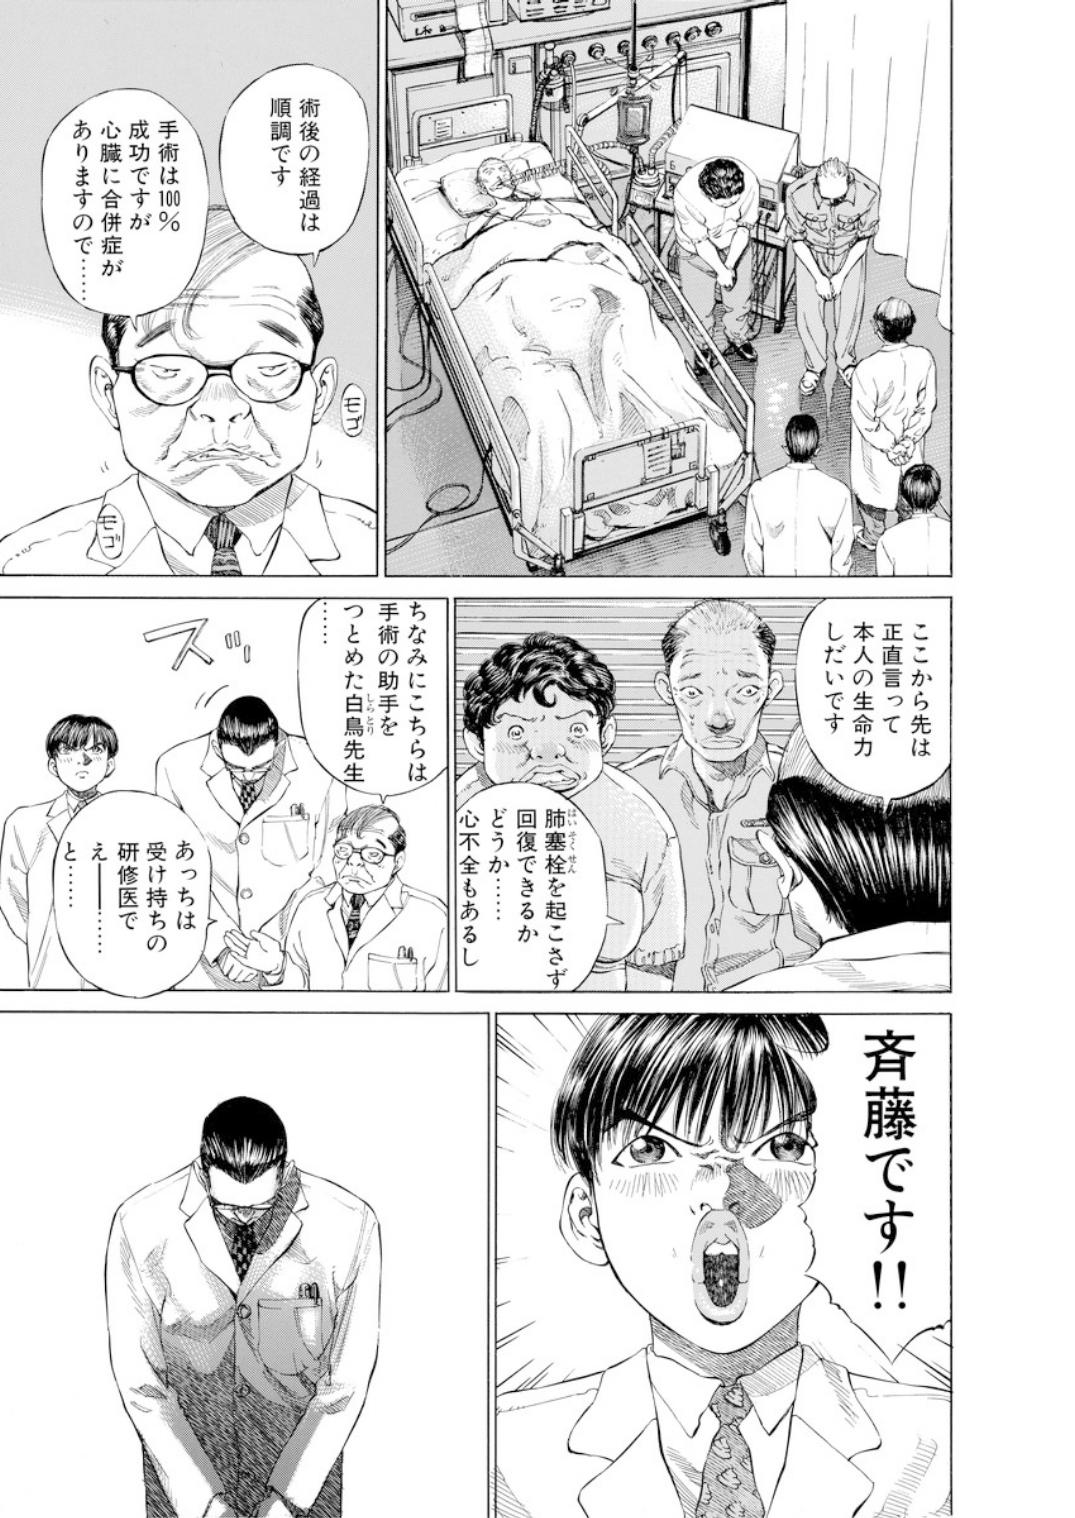 001bj_page-0091.jpg